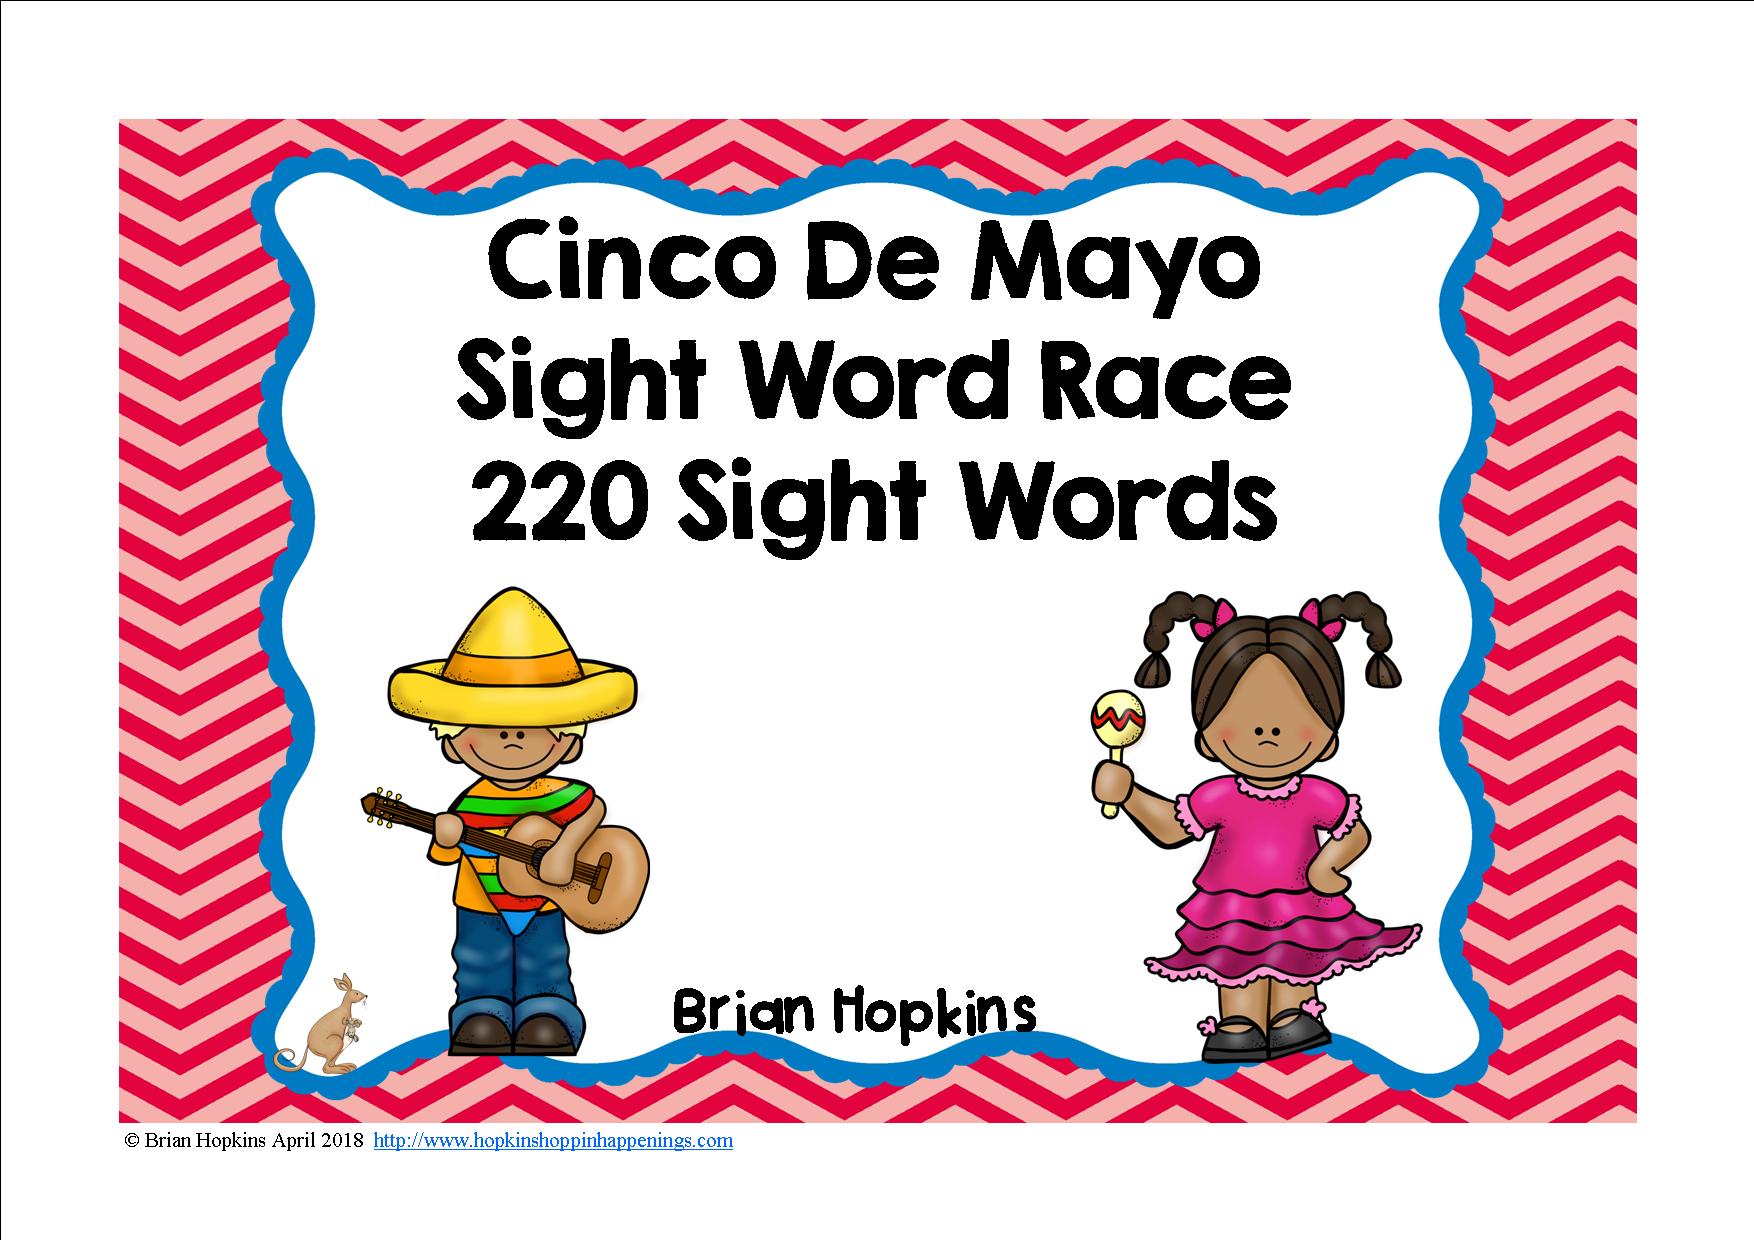 Cinco De Mayo Sight Word Race